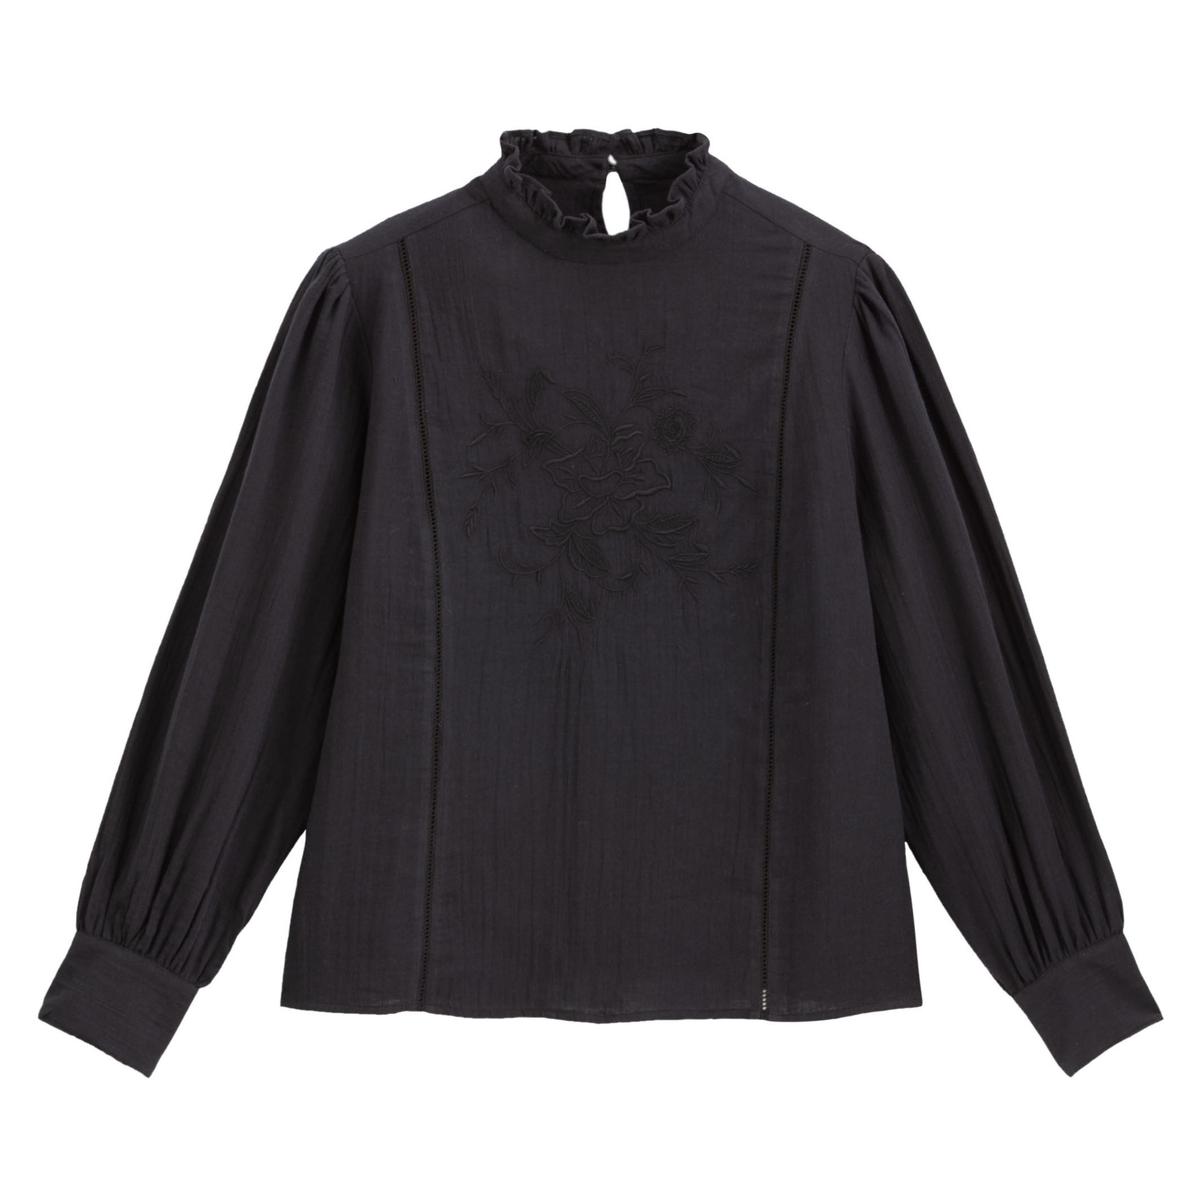 Blusa bordada con cuello alto y manga larga